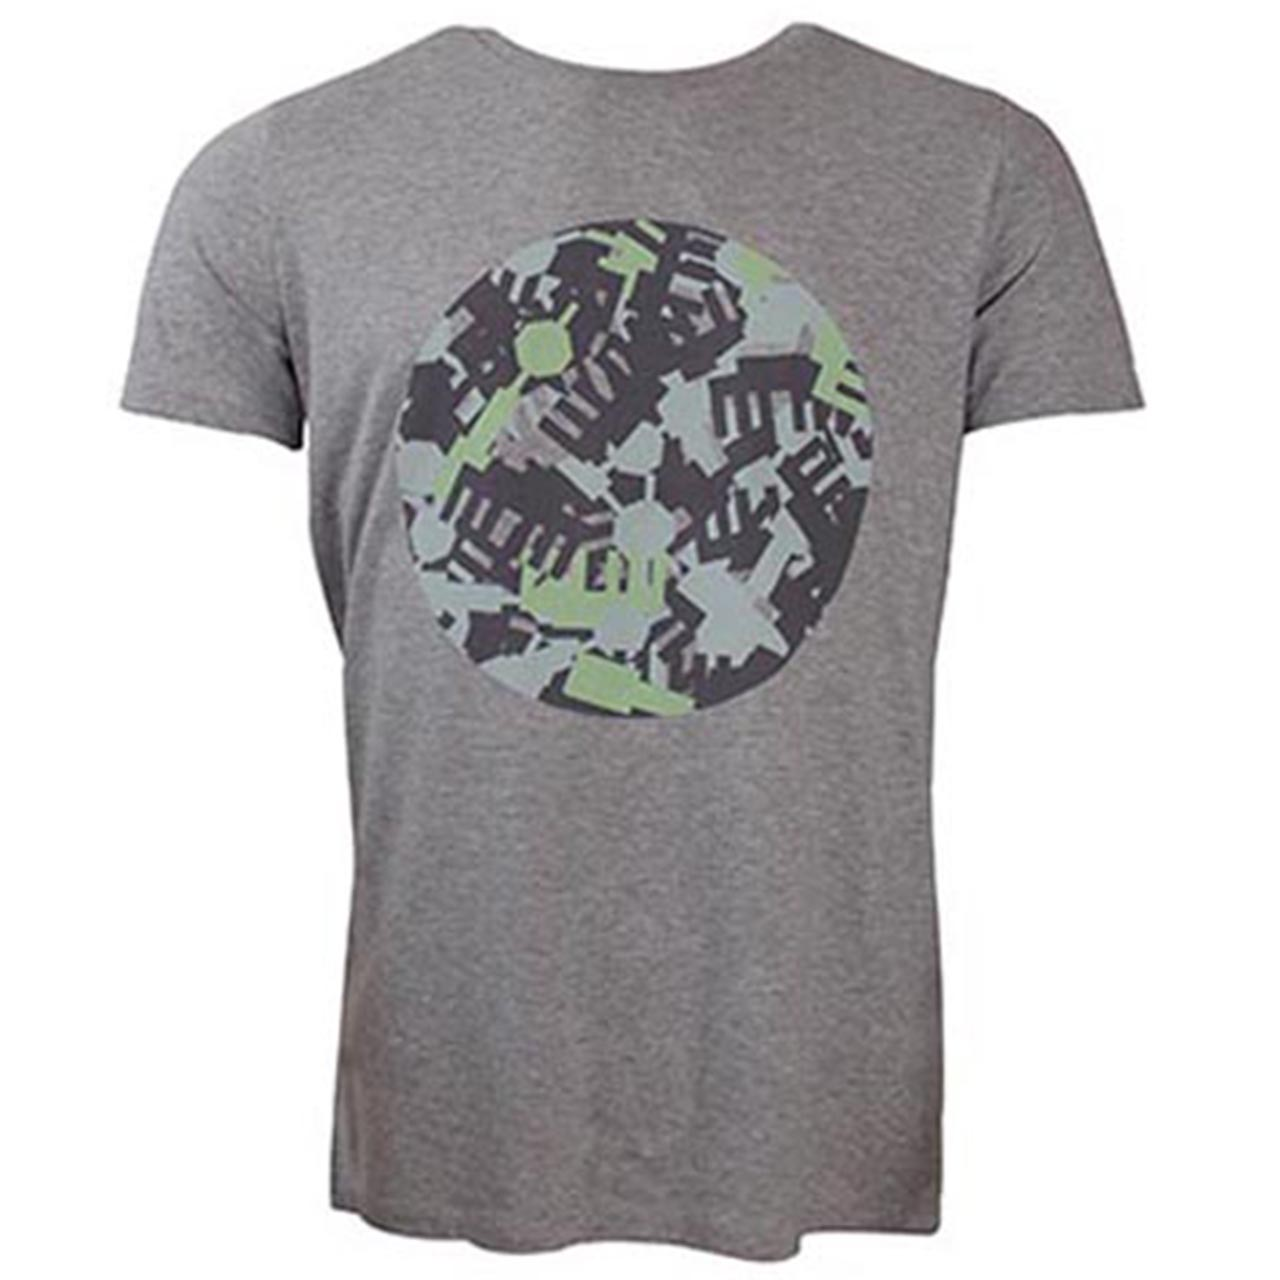 Berlin T-Shirt Kreis Camouglage hell-grau/grün